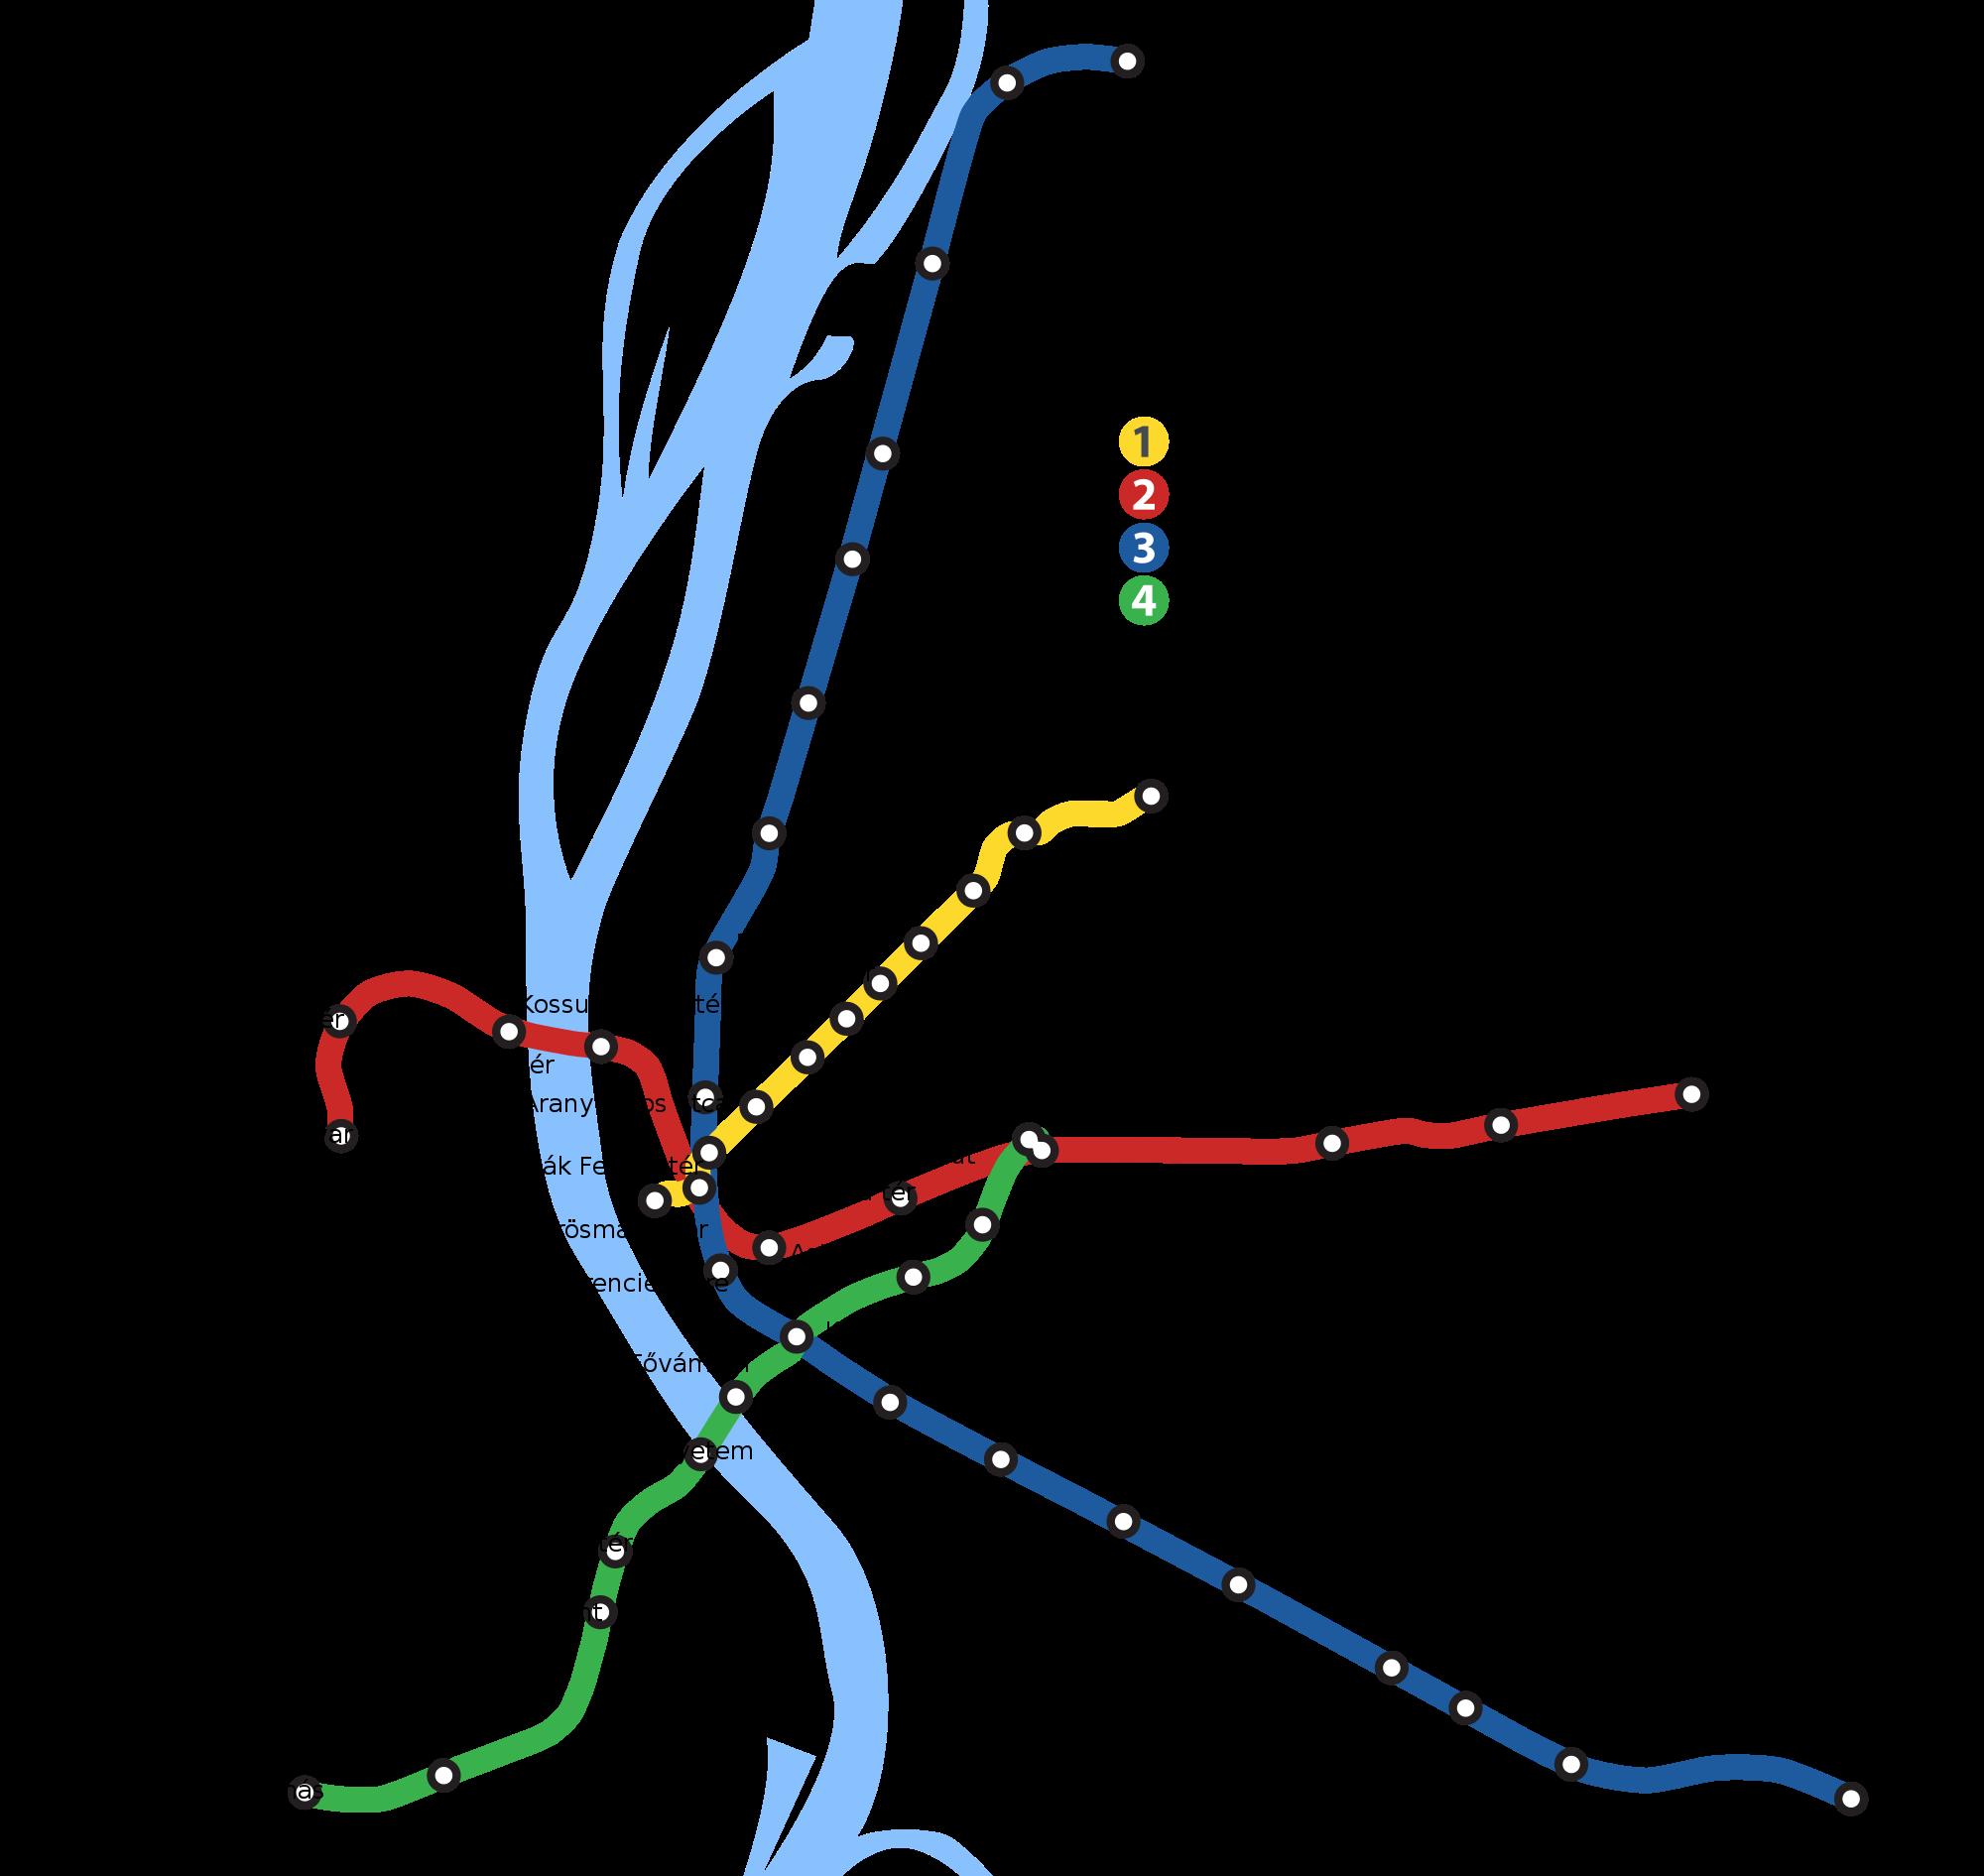 budapest astoria térkép File:Budapest Metro Geographical Map.SVG   Wikimedia Commons budapest astoria térkép